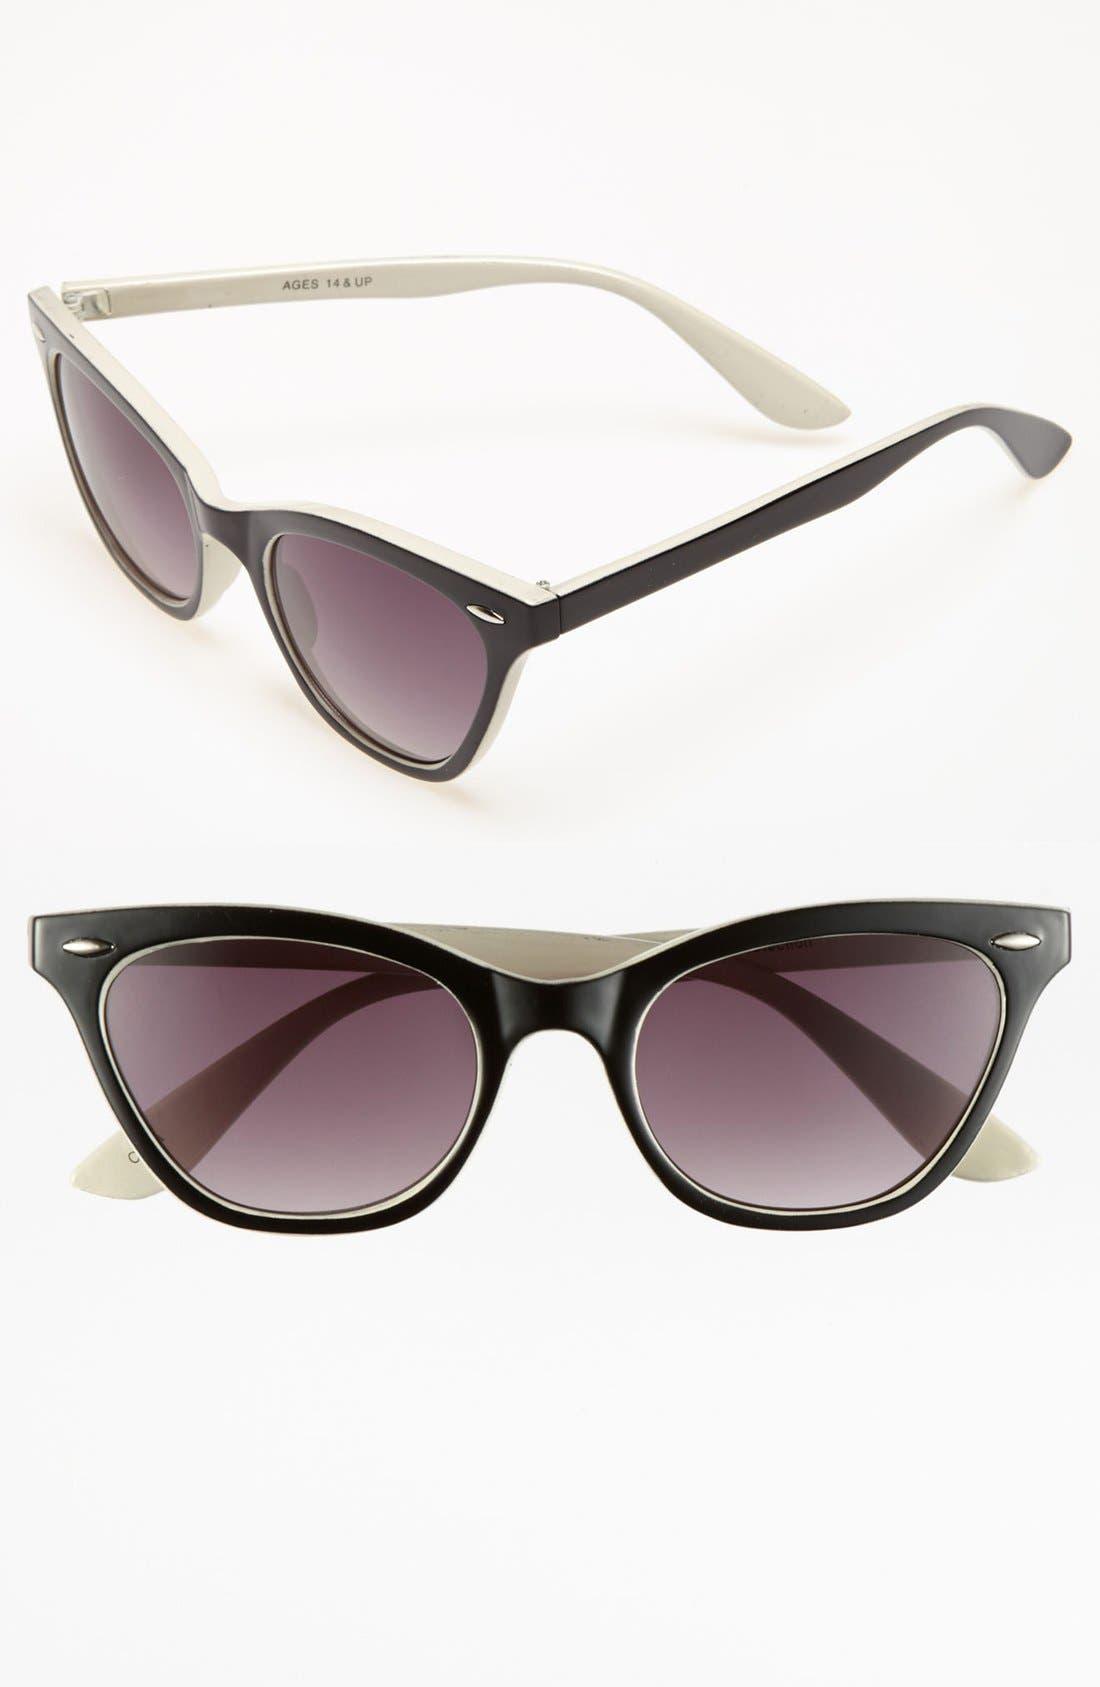 Alternate Image 1 Selected - FE NY 'Wink' Sunglasses